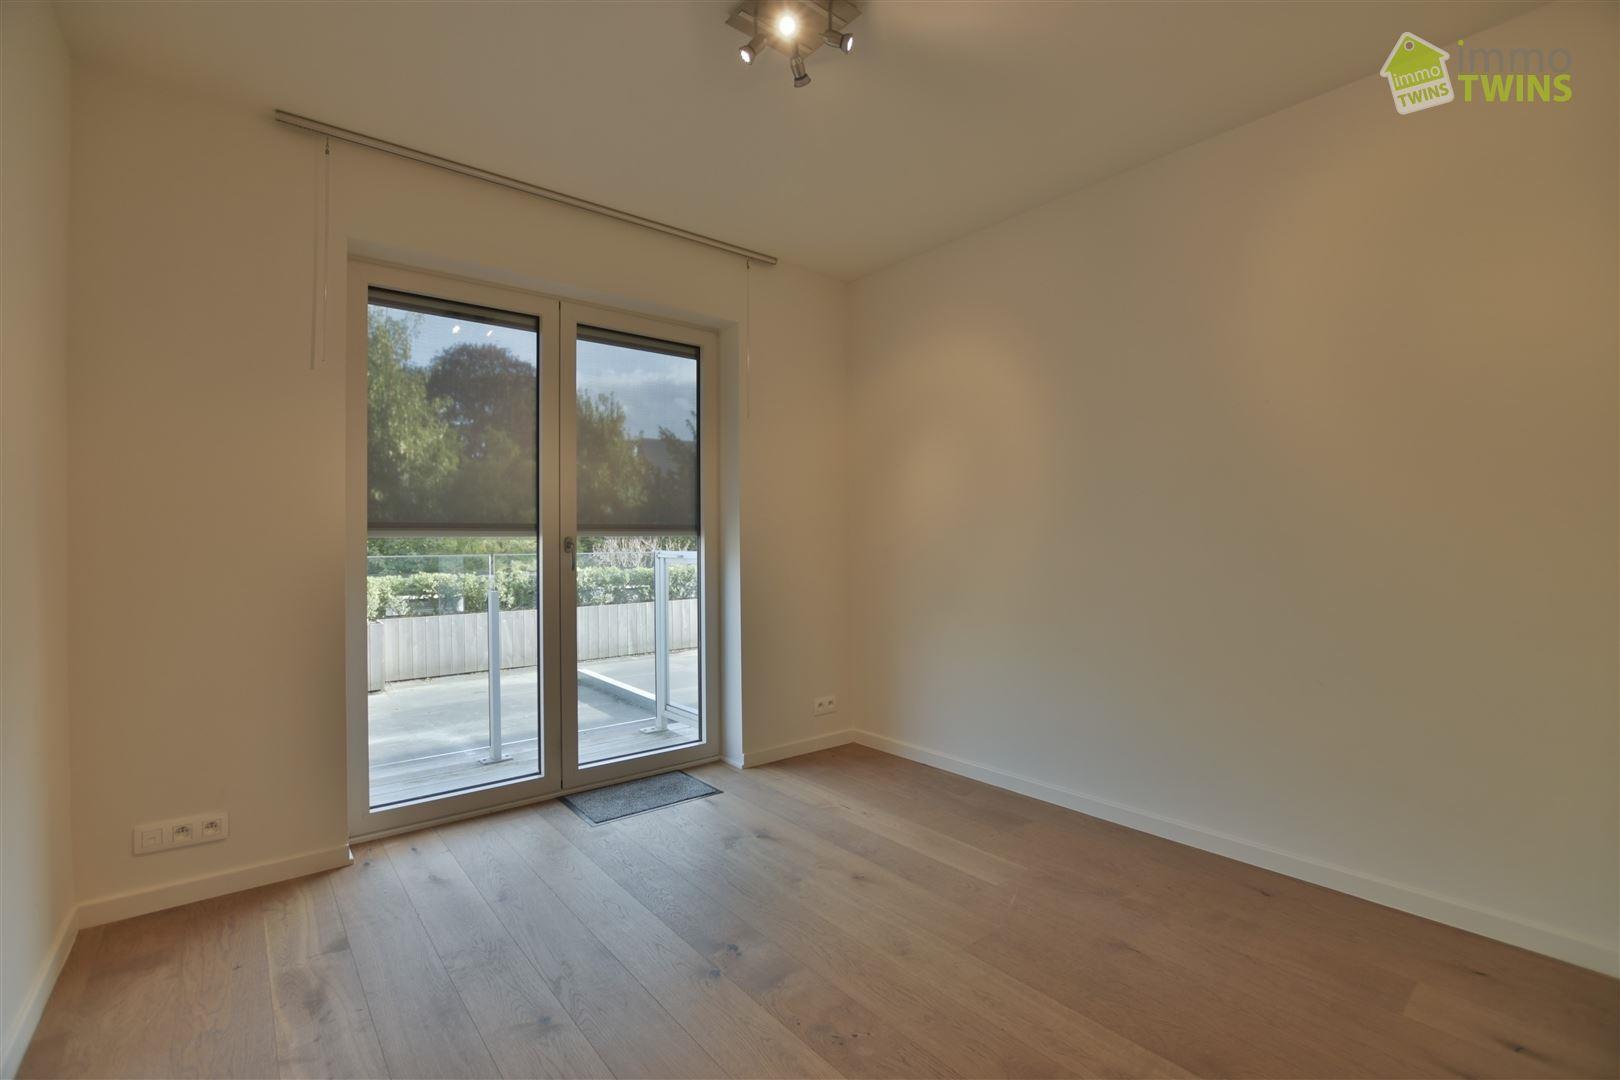 Foto 14 : Appartement te 9200 DENDERMONDE (België) - Prijs € 1.100